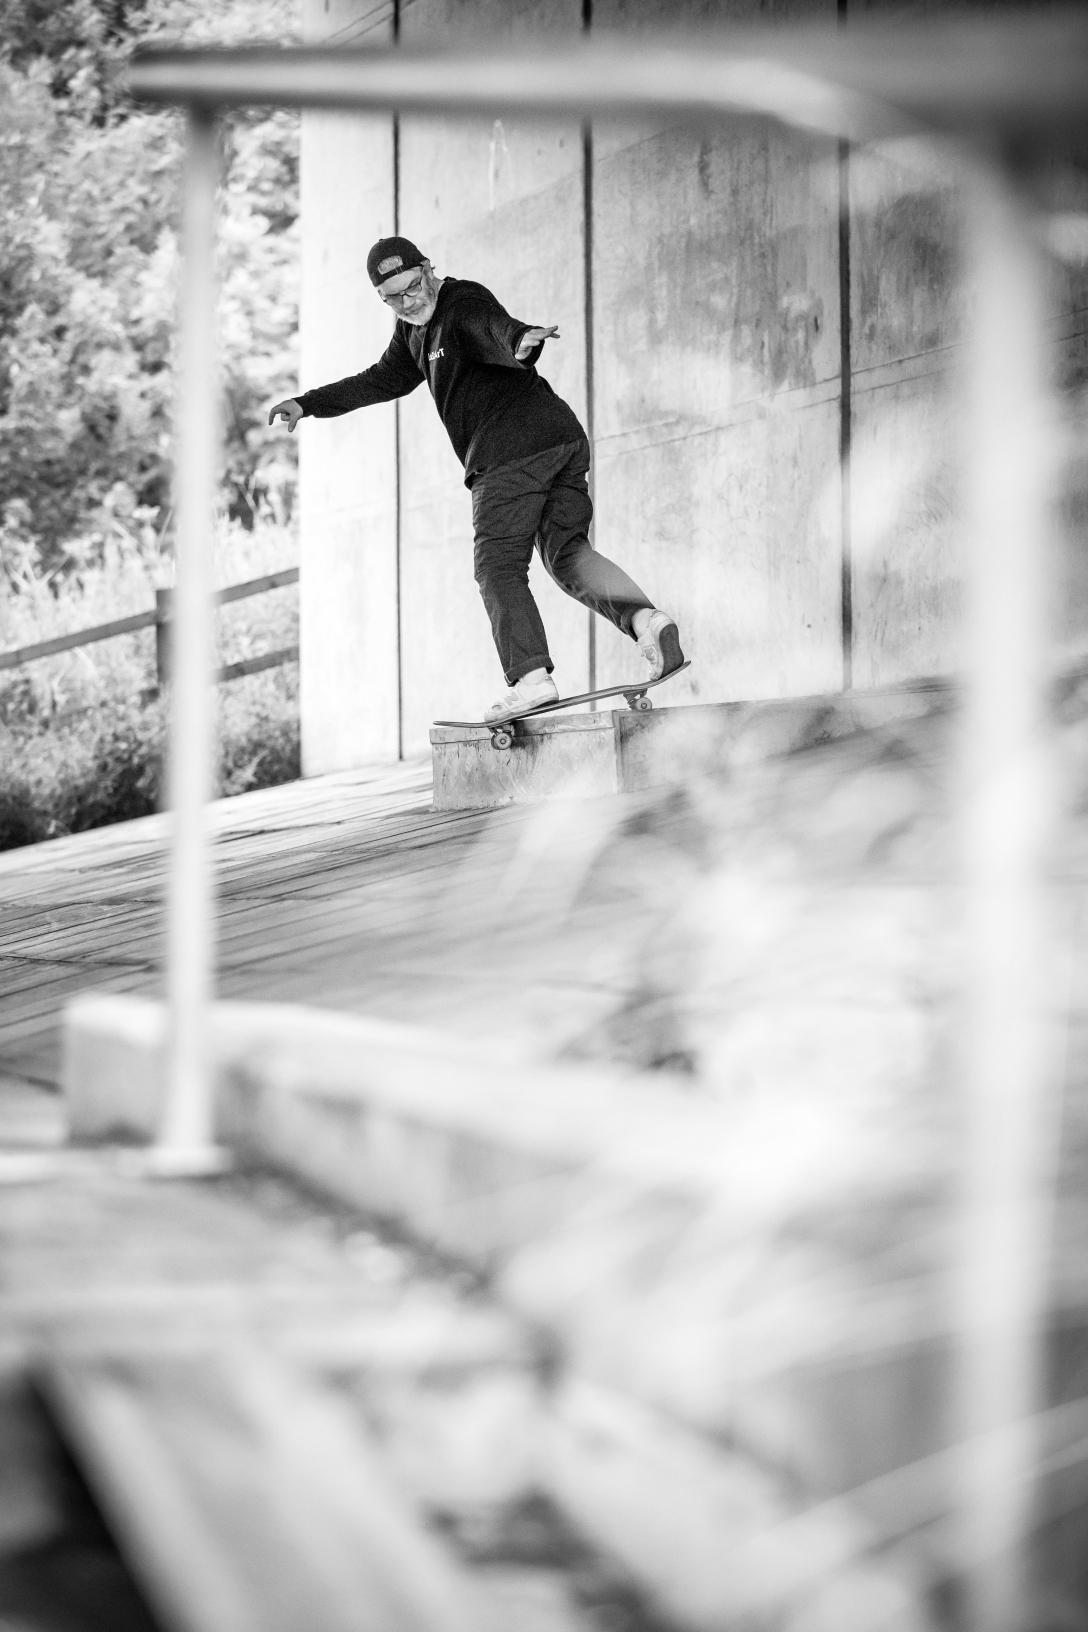 David-Mackey-Backside-Lipslide-Preston-New Balance Numeric Barge at Will tour photo-Chris Johnson Speedway Skateboarding Magazine